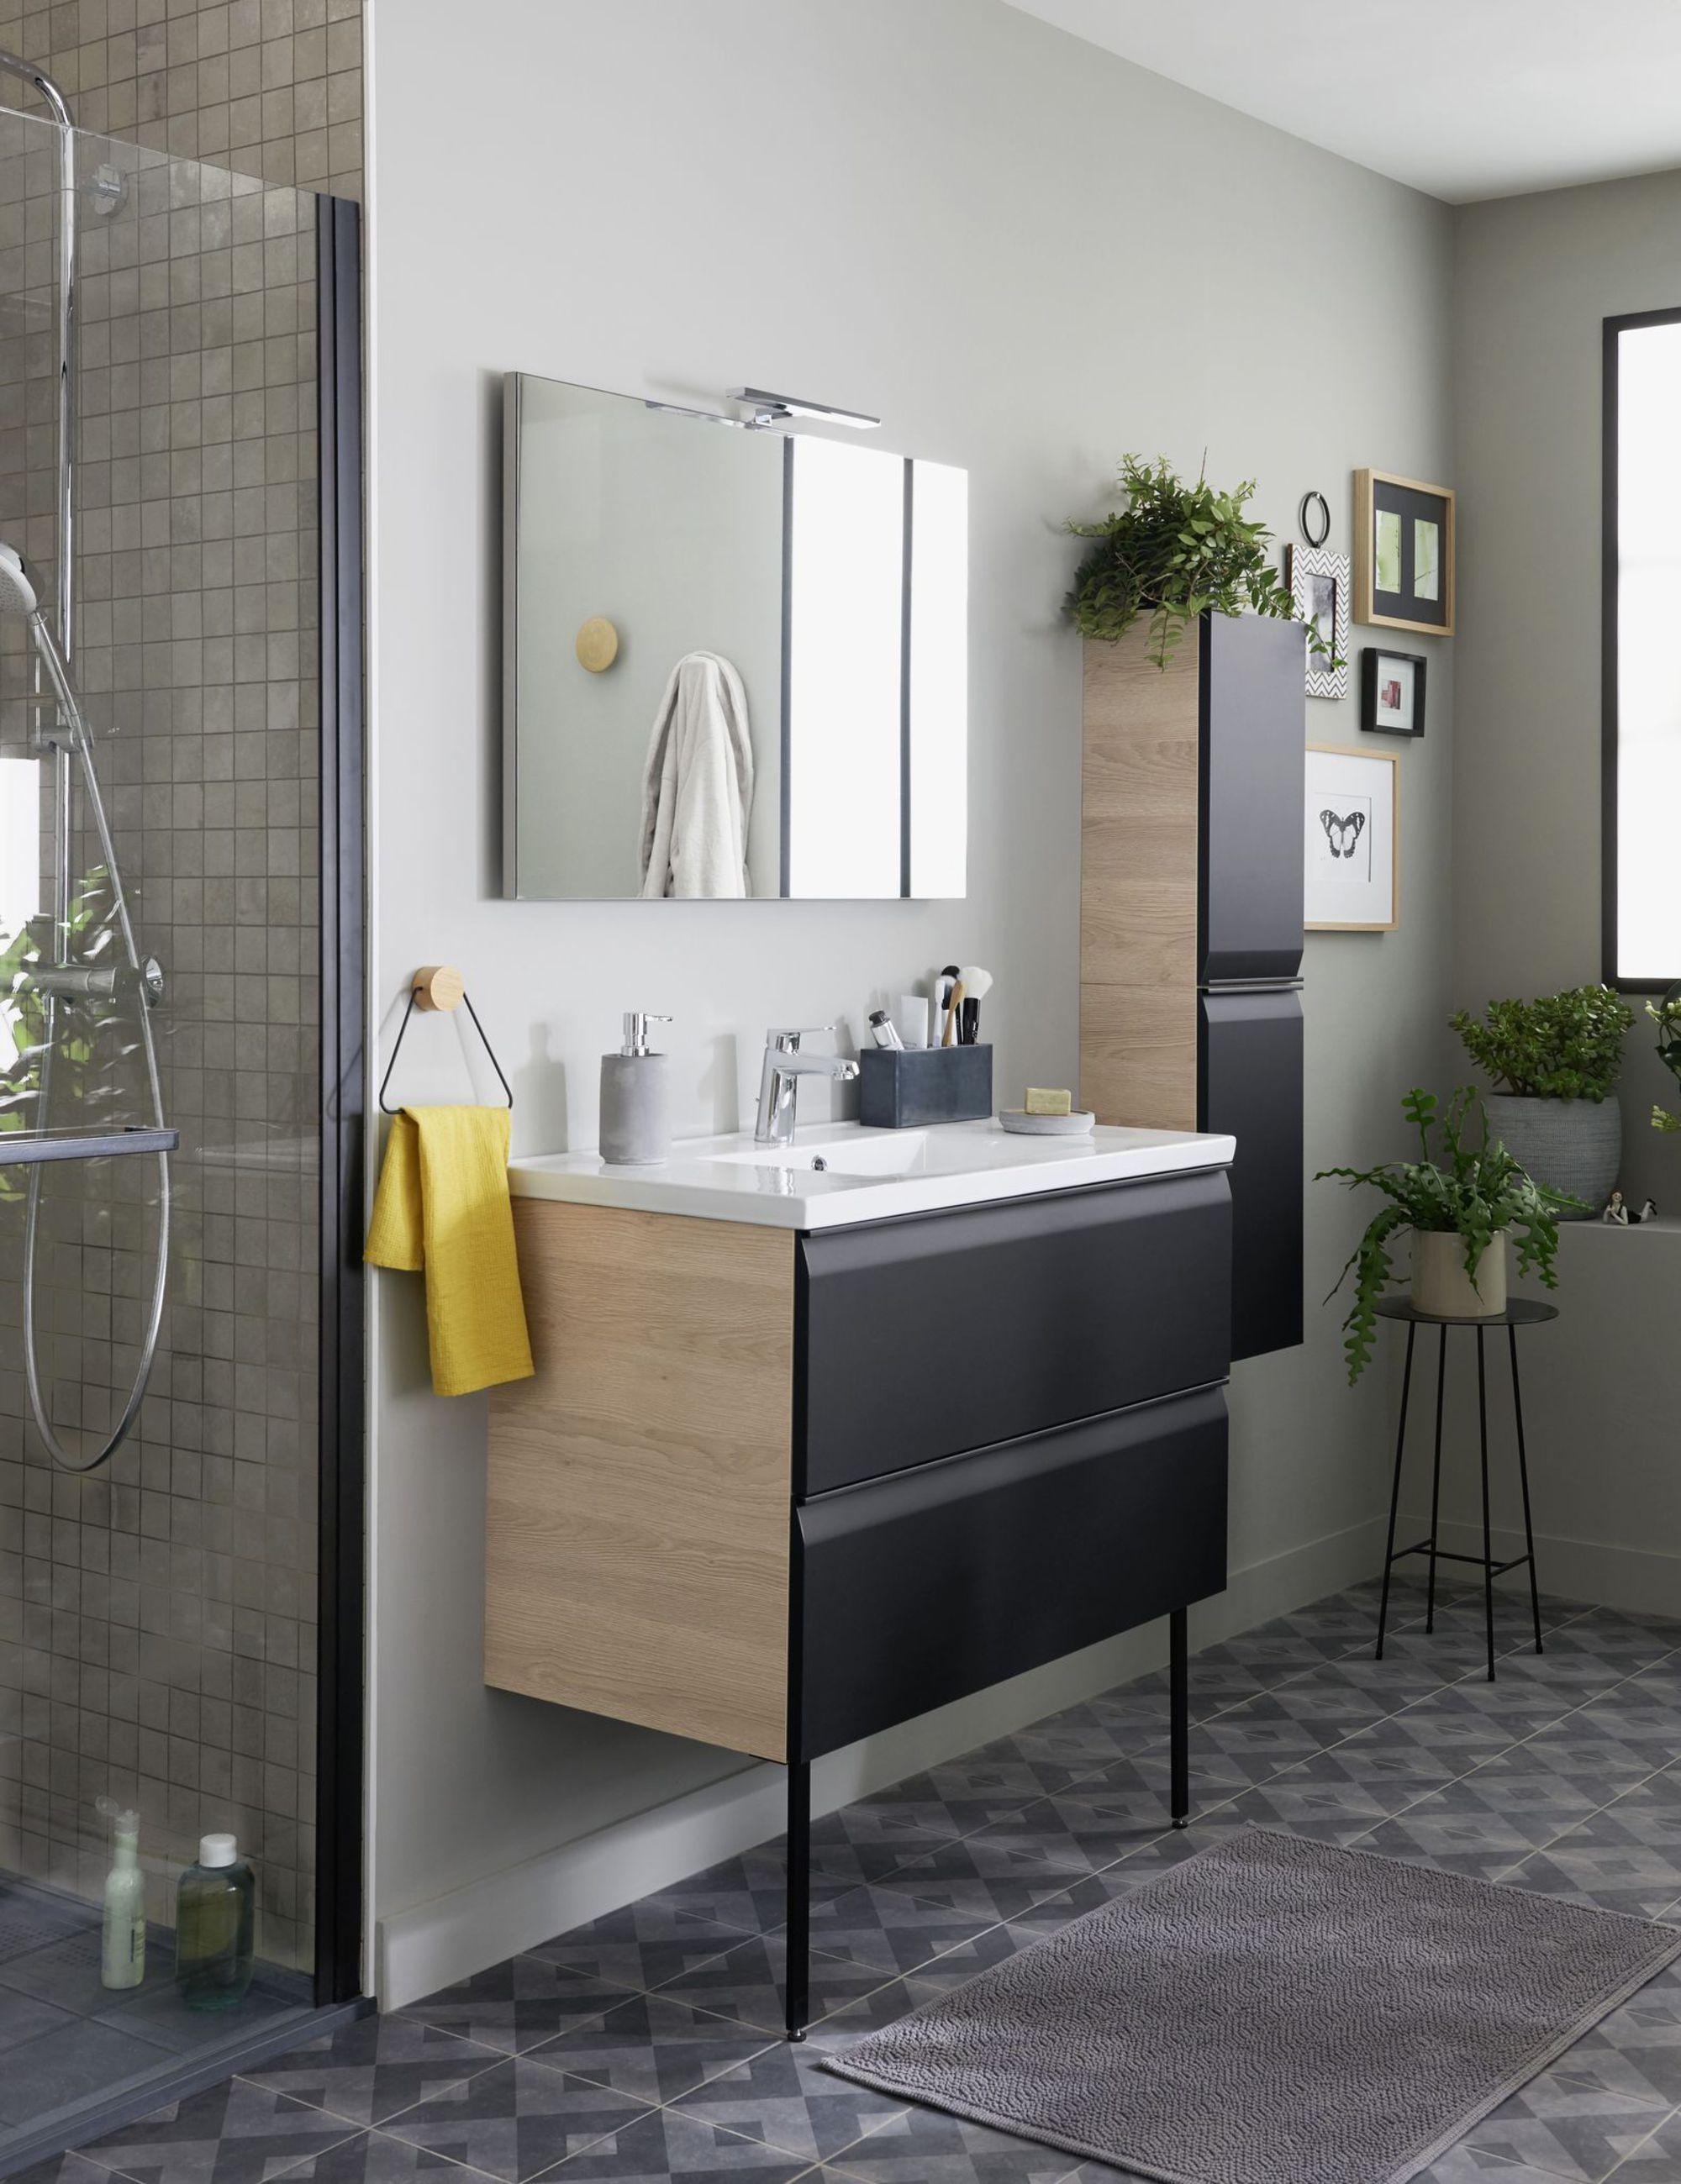 Meuble salle bain bois design ikea lapeyre - Meuble d angle salle de bain ikea ...